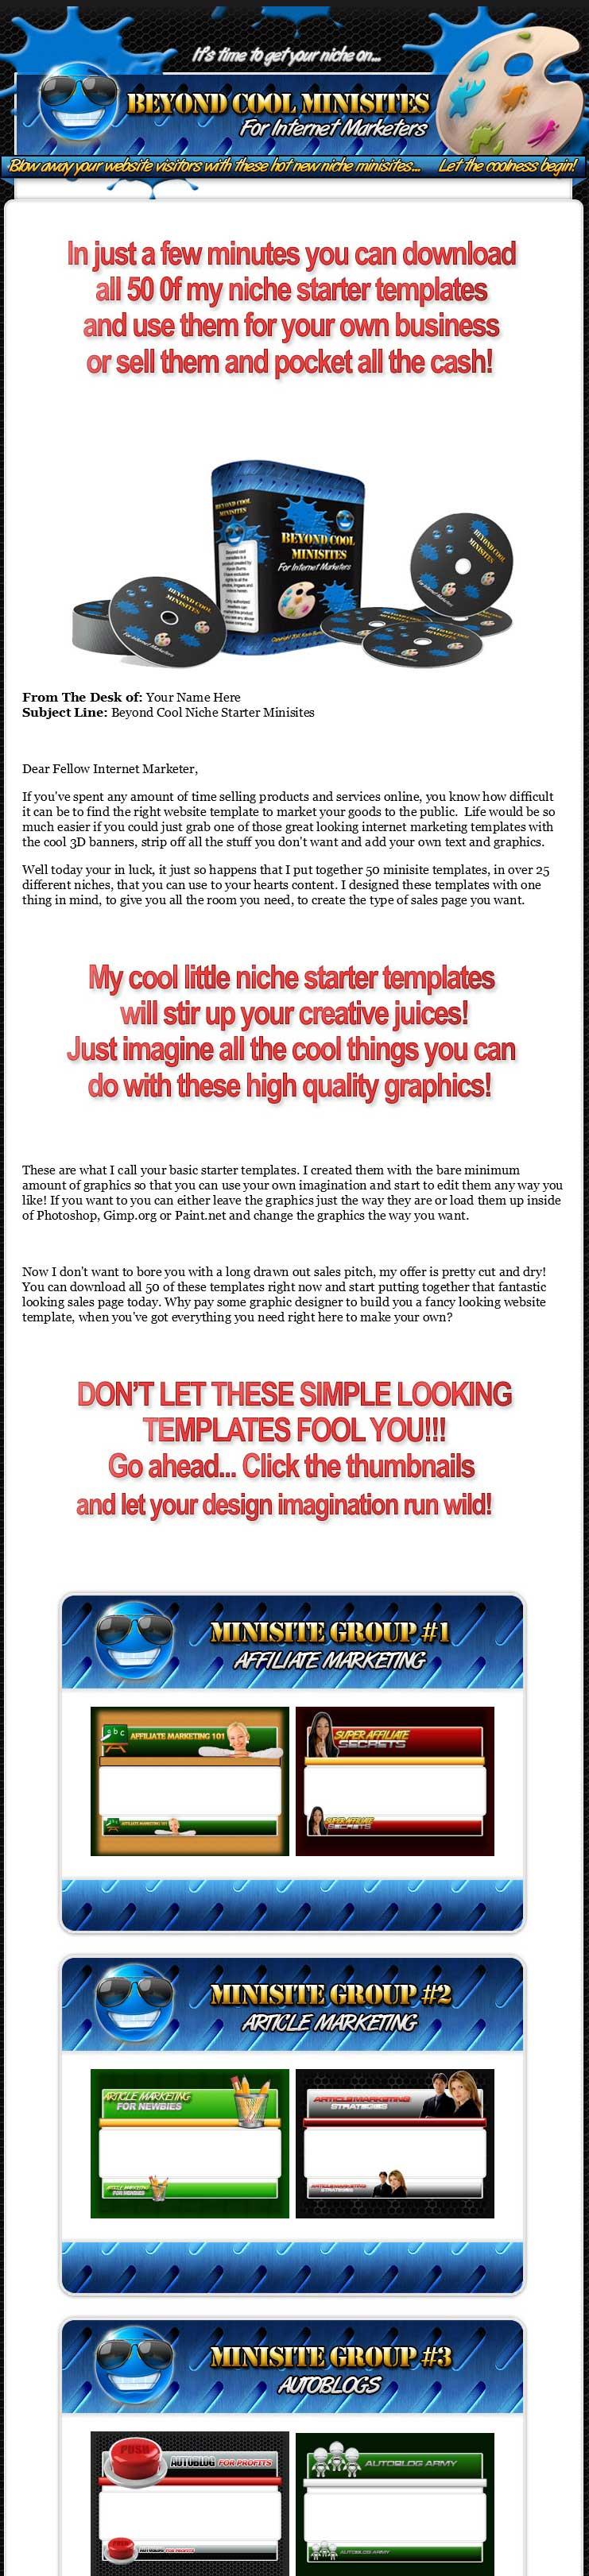 Beyond Cool Minisites Website Templates MRR